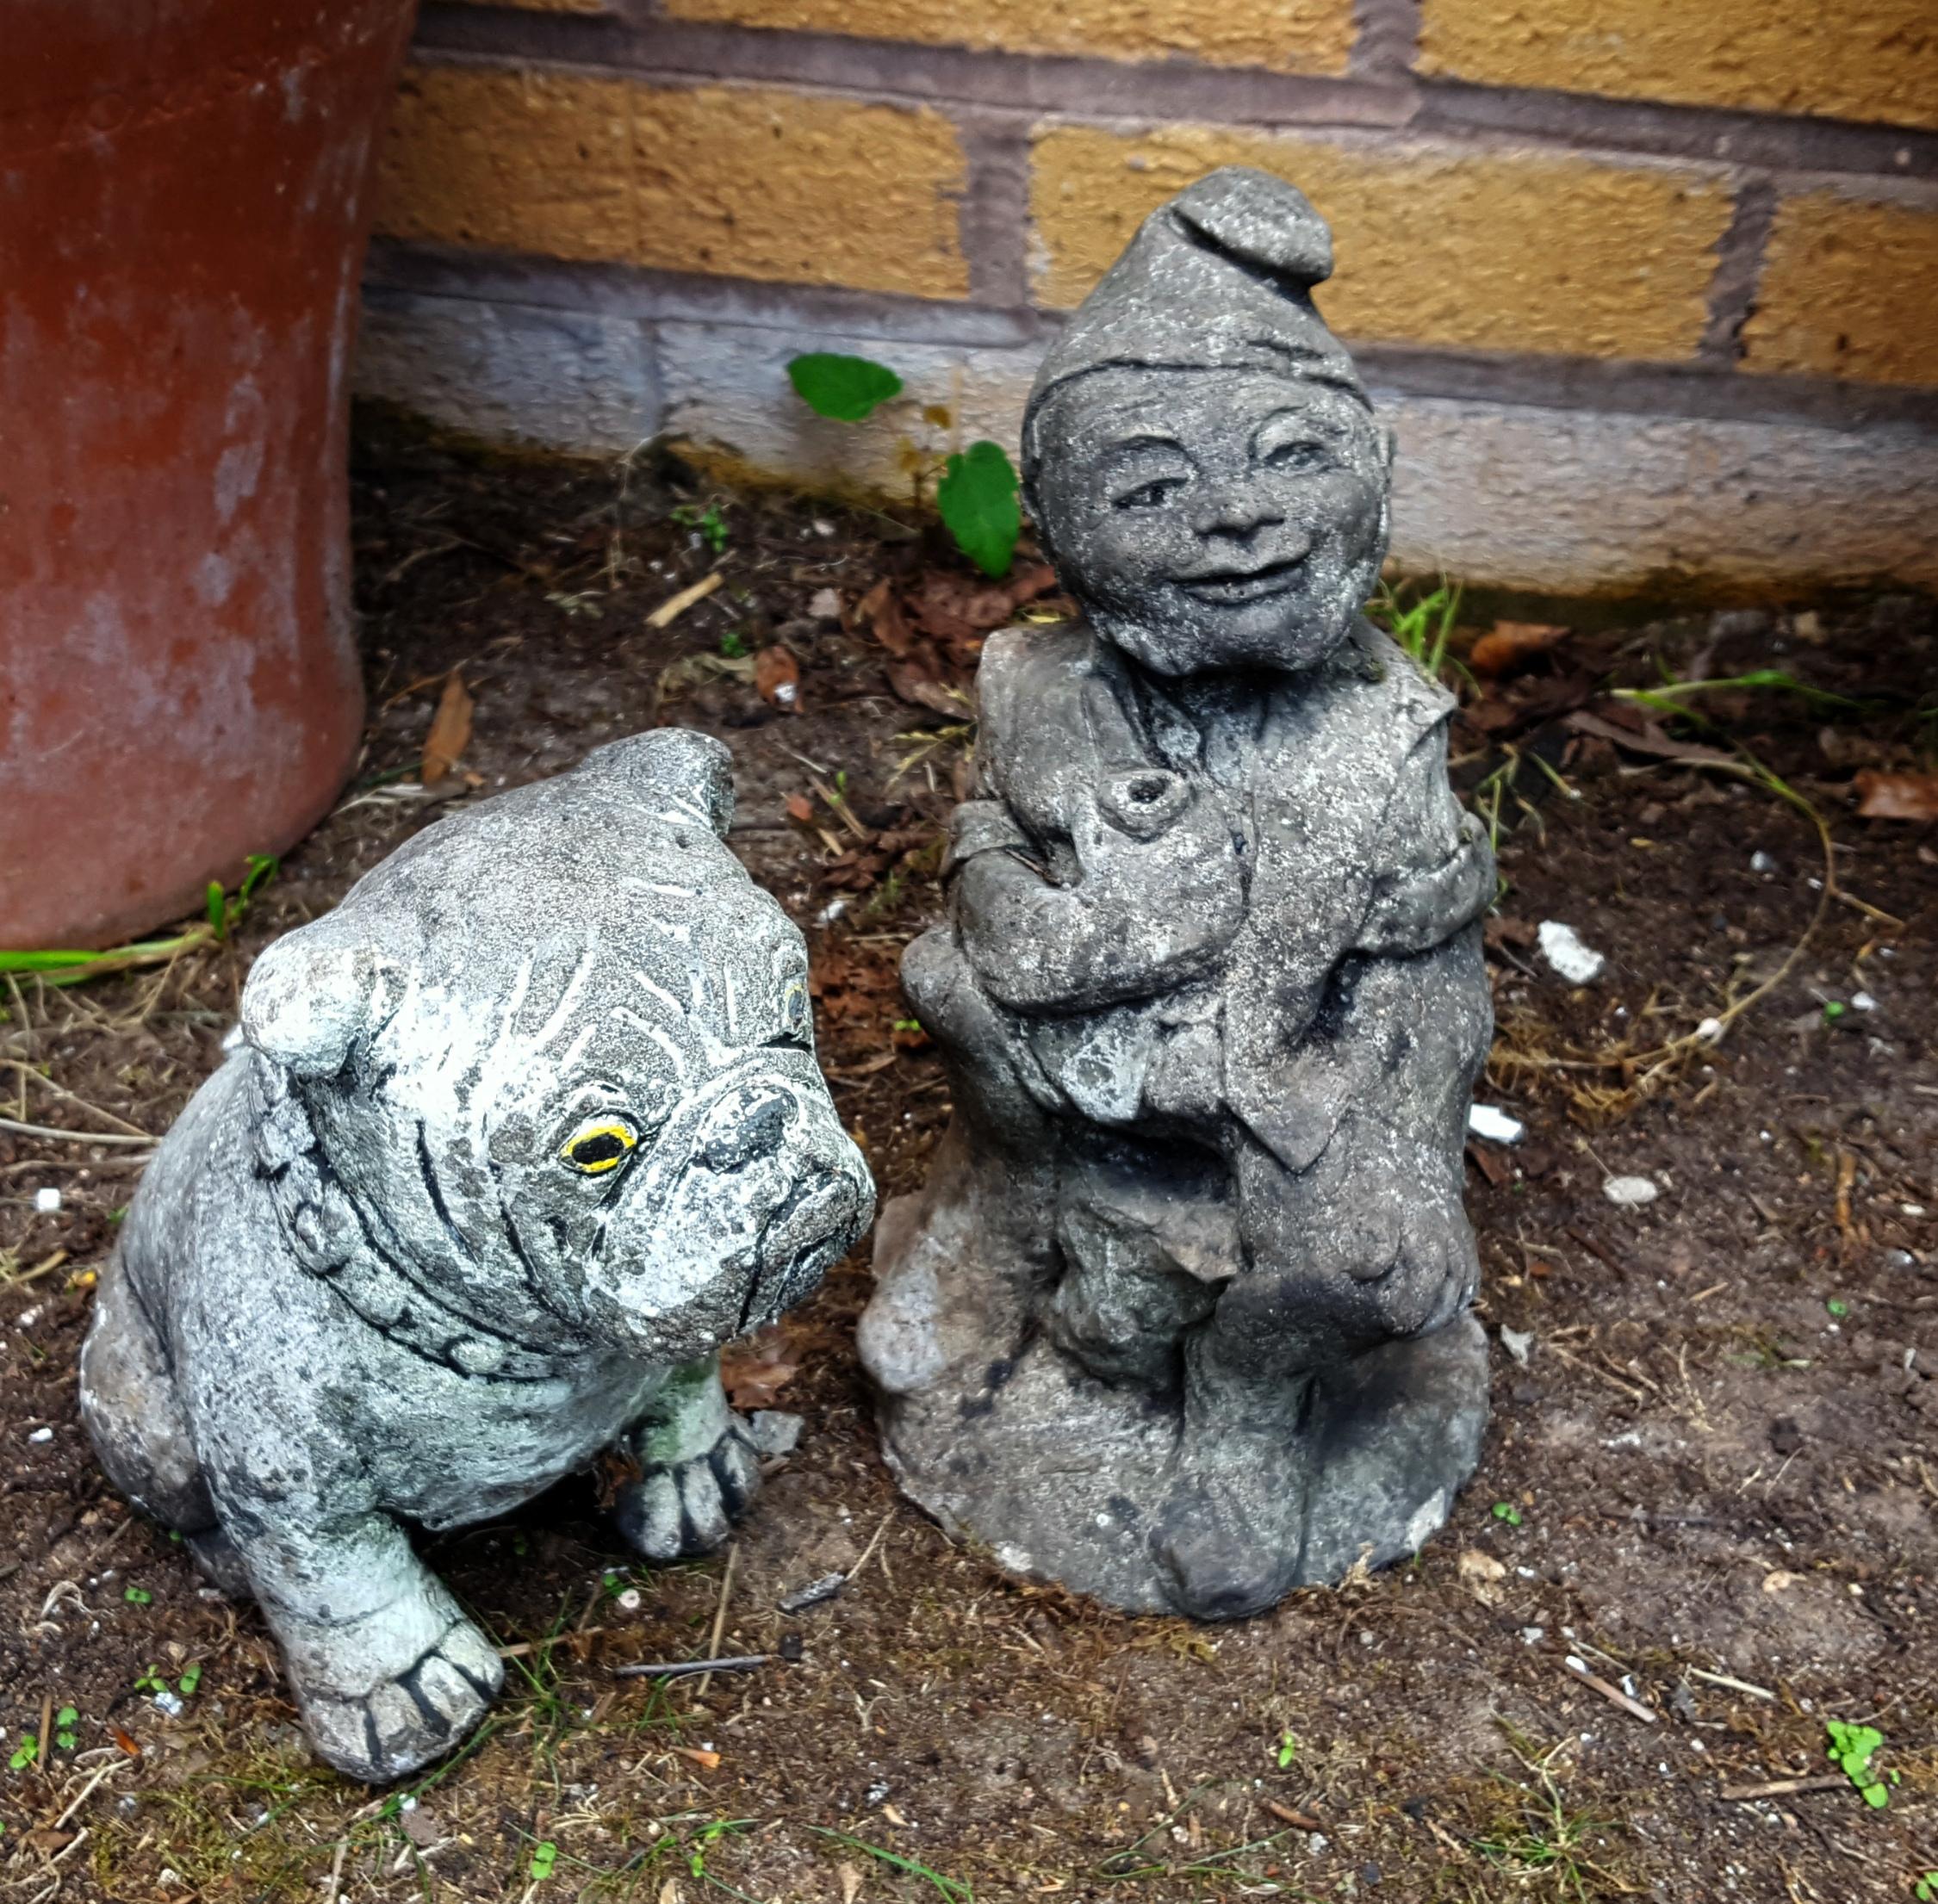 Lot 114 - Vintage Garden Ornaments Gnome & Bulldog Reconstituted Stone NO RESERVE